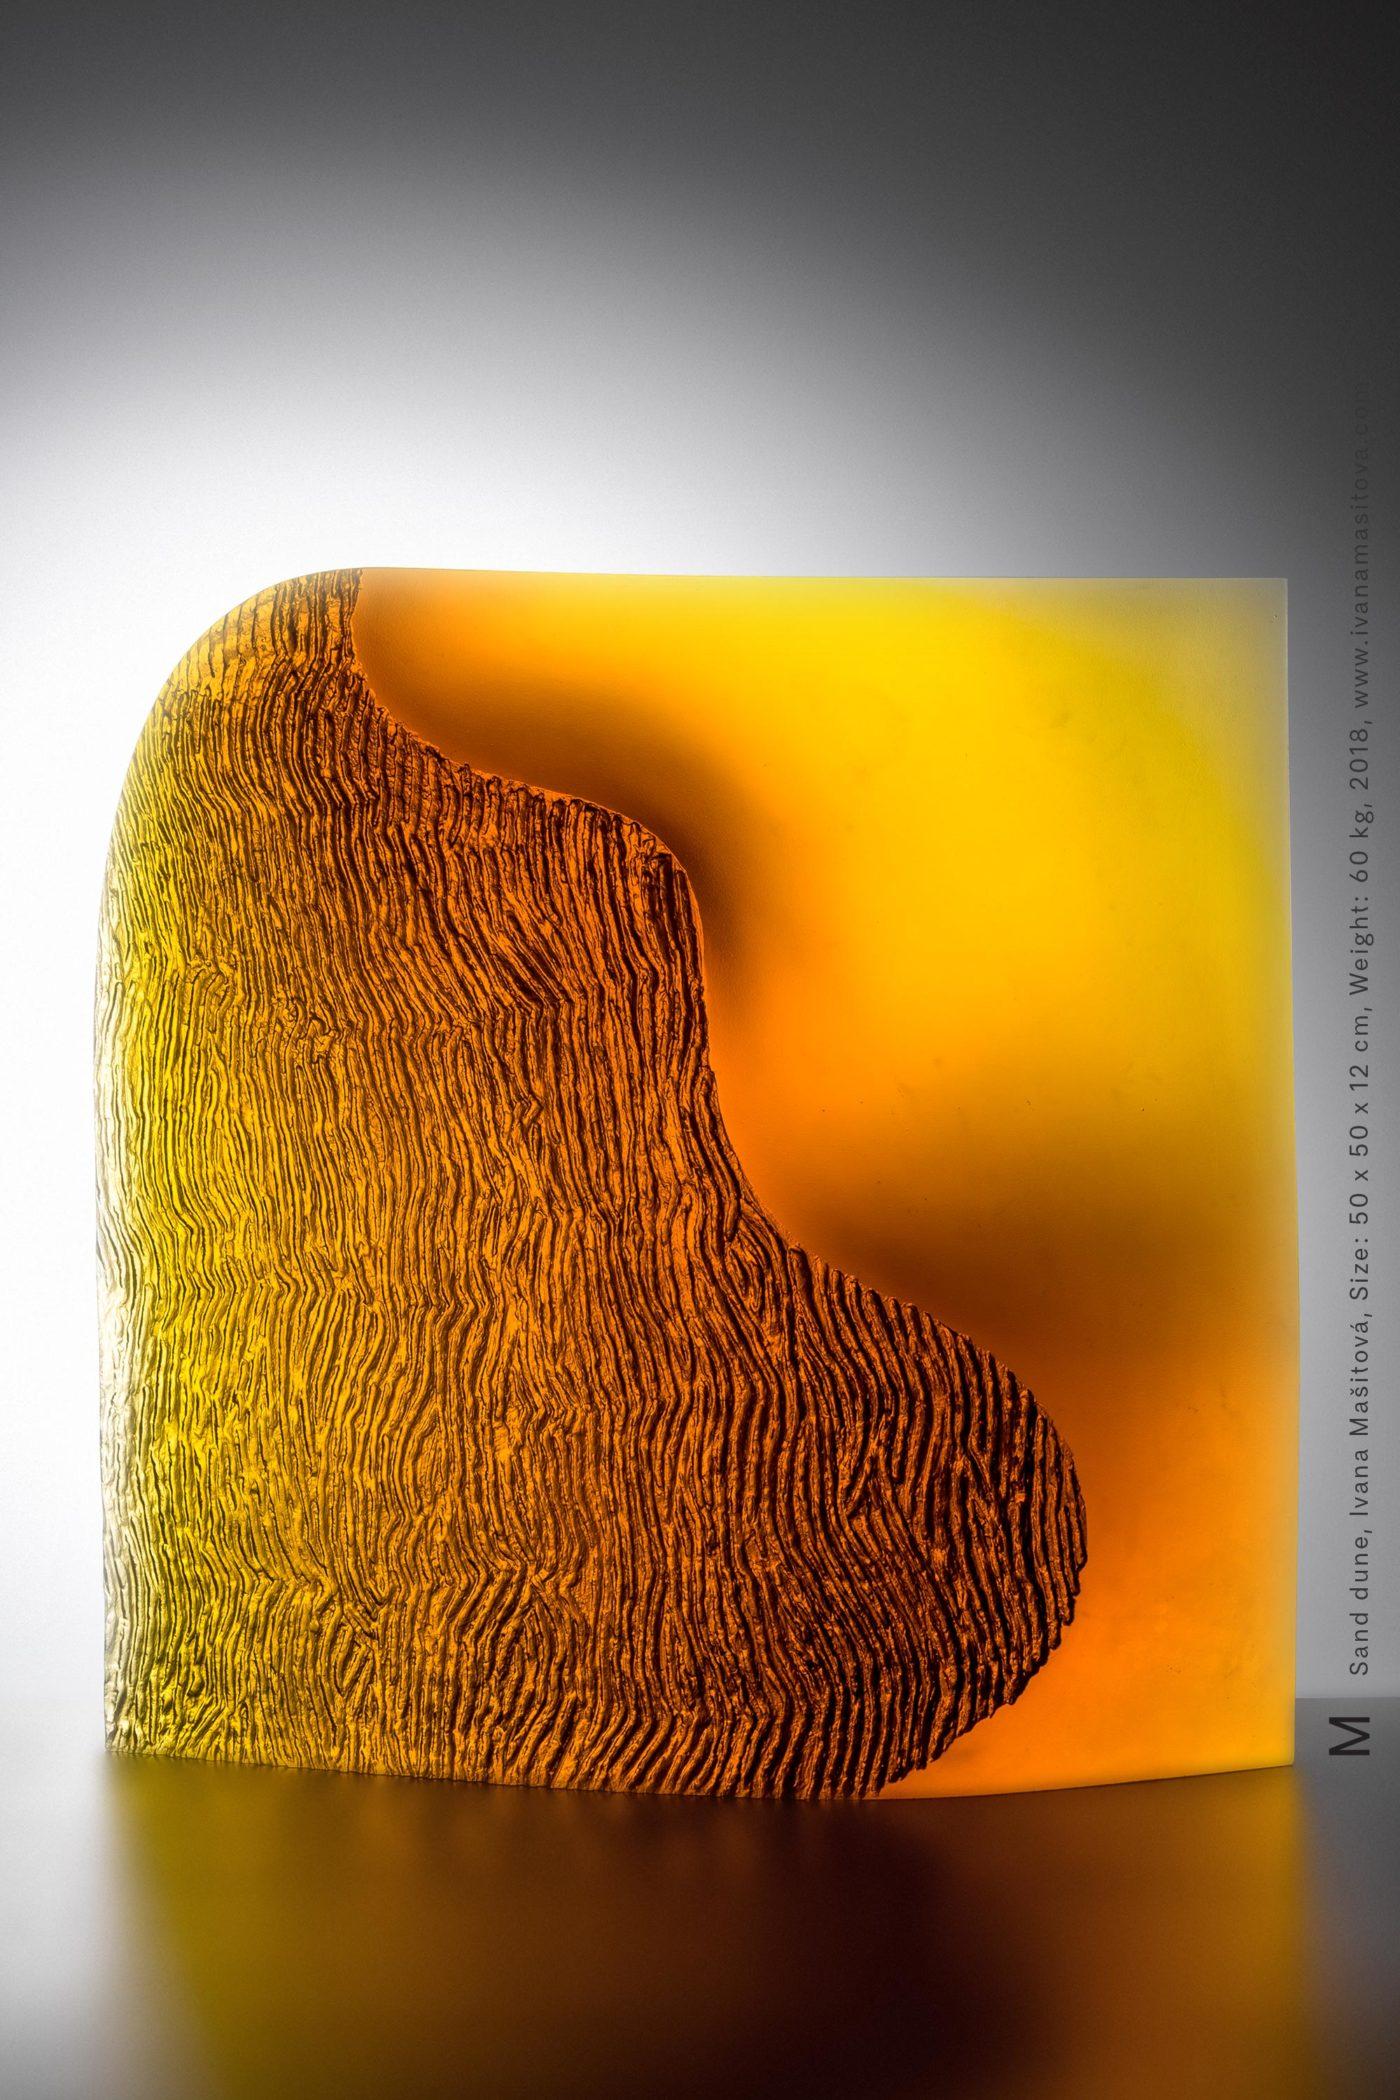 Pisecna-duna_Sand-dune,50x50x12cm,60kg,2018-2